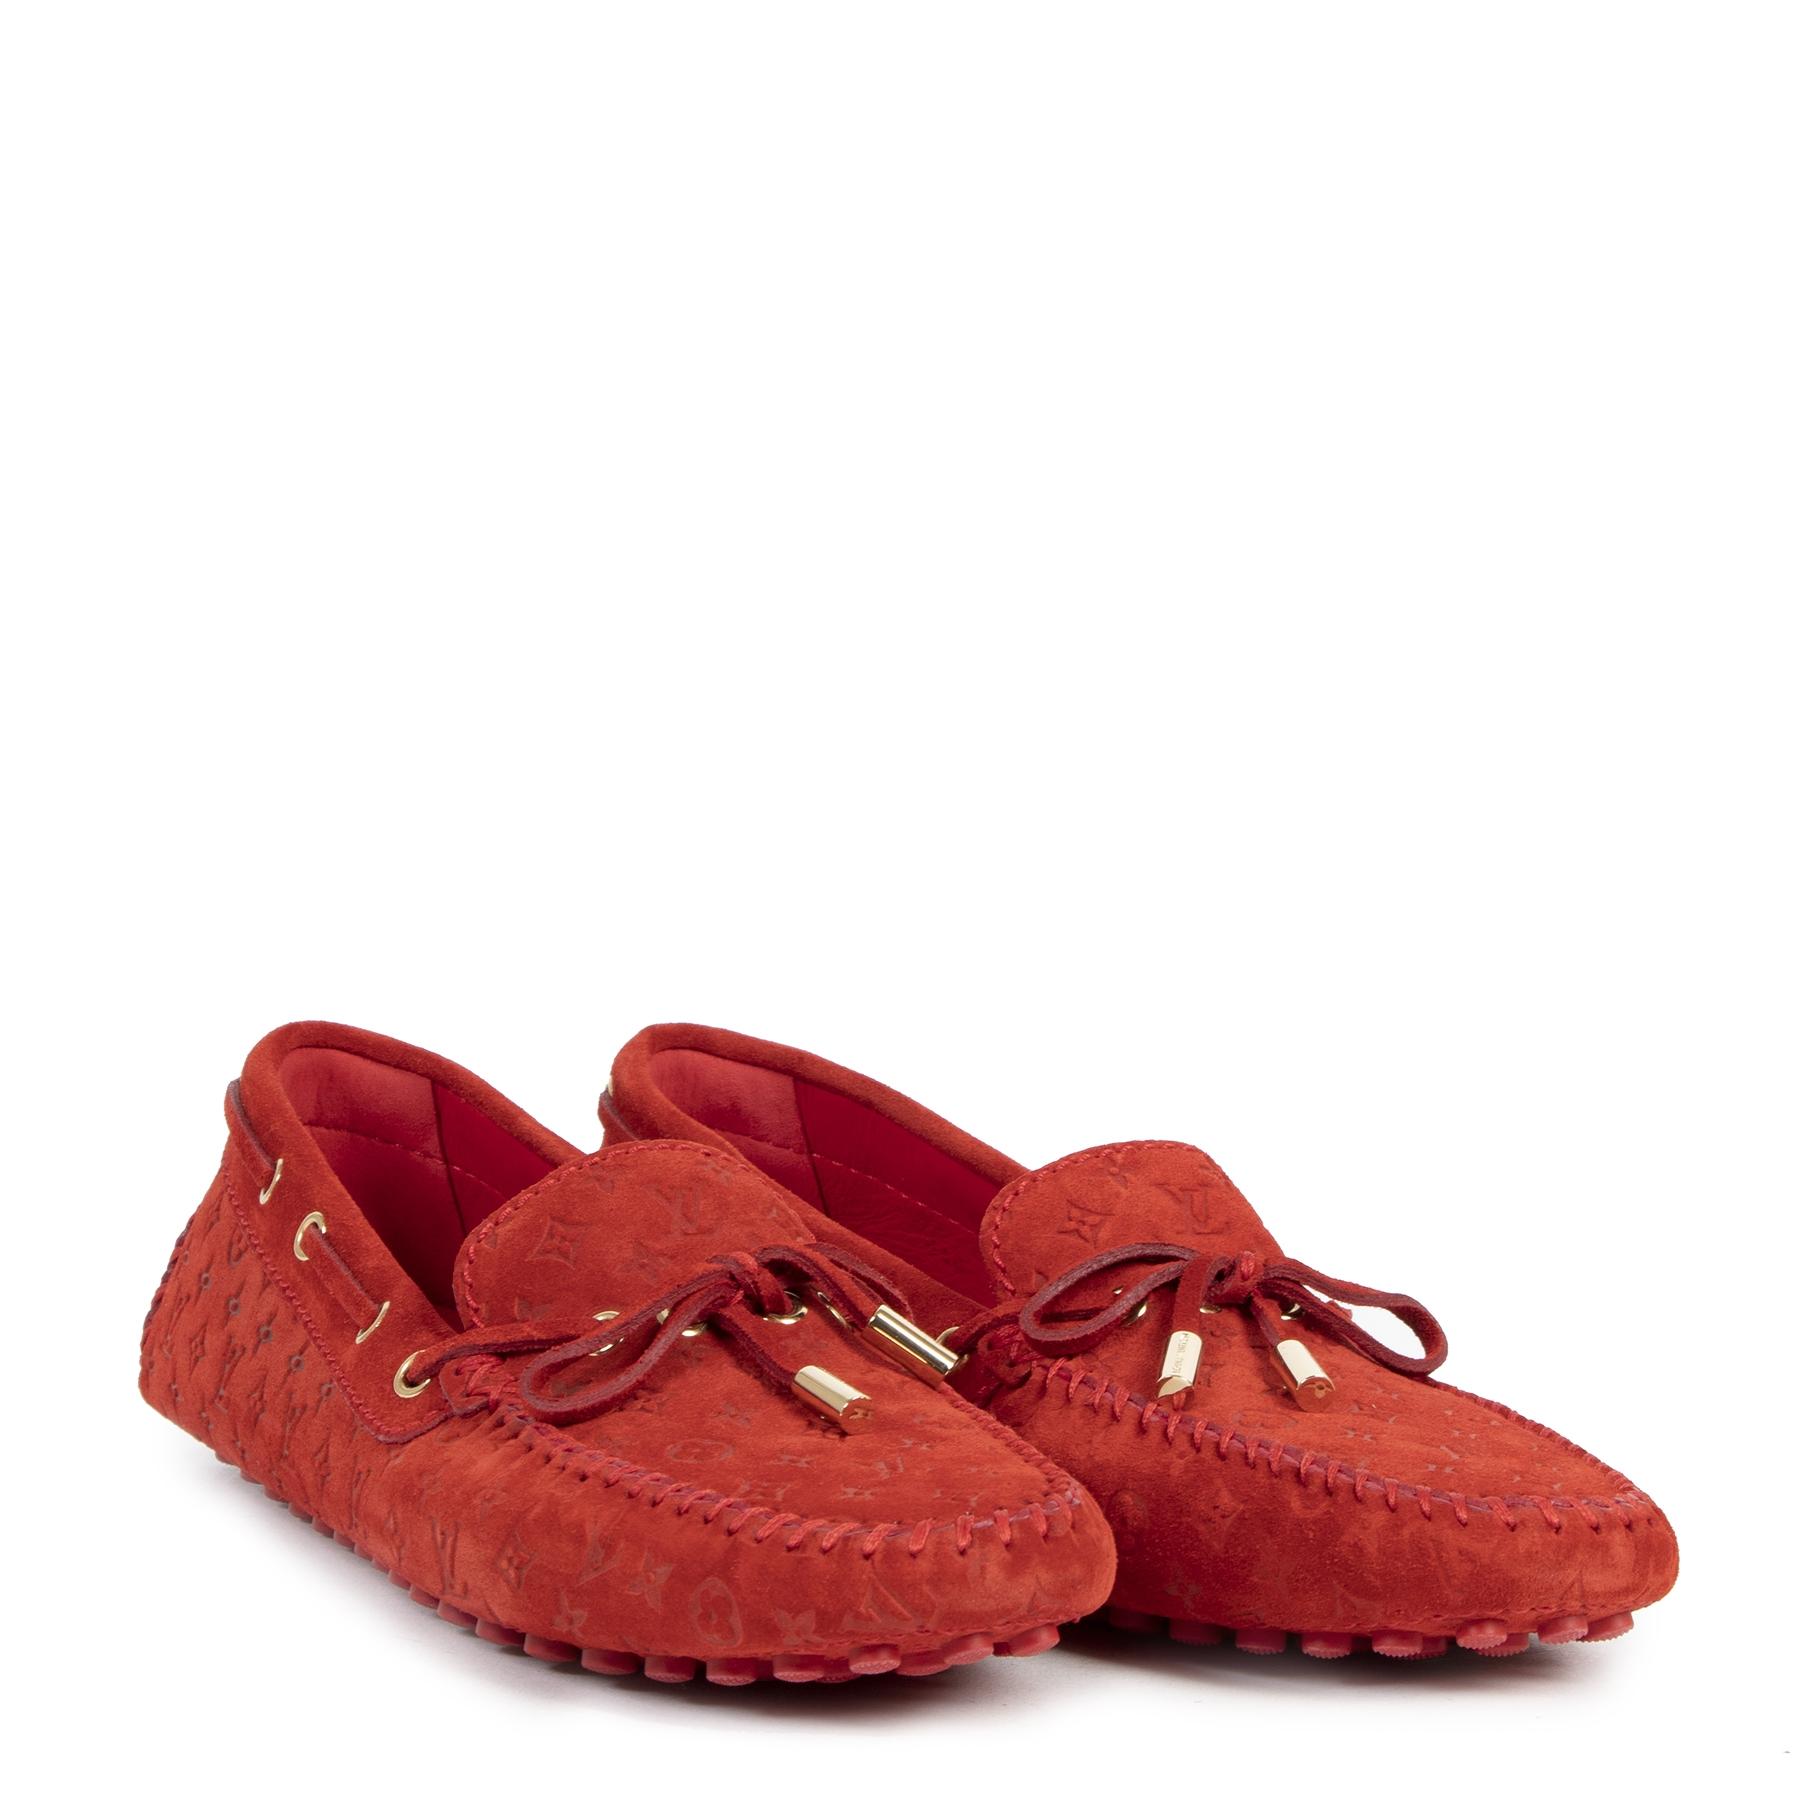 Authentieke tweedehands vintage Louis Vuitton Monogram Red Loafers - Size 40 koop online webshop LabelLOV